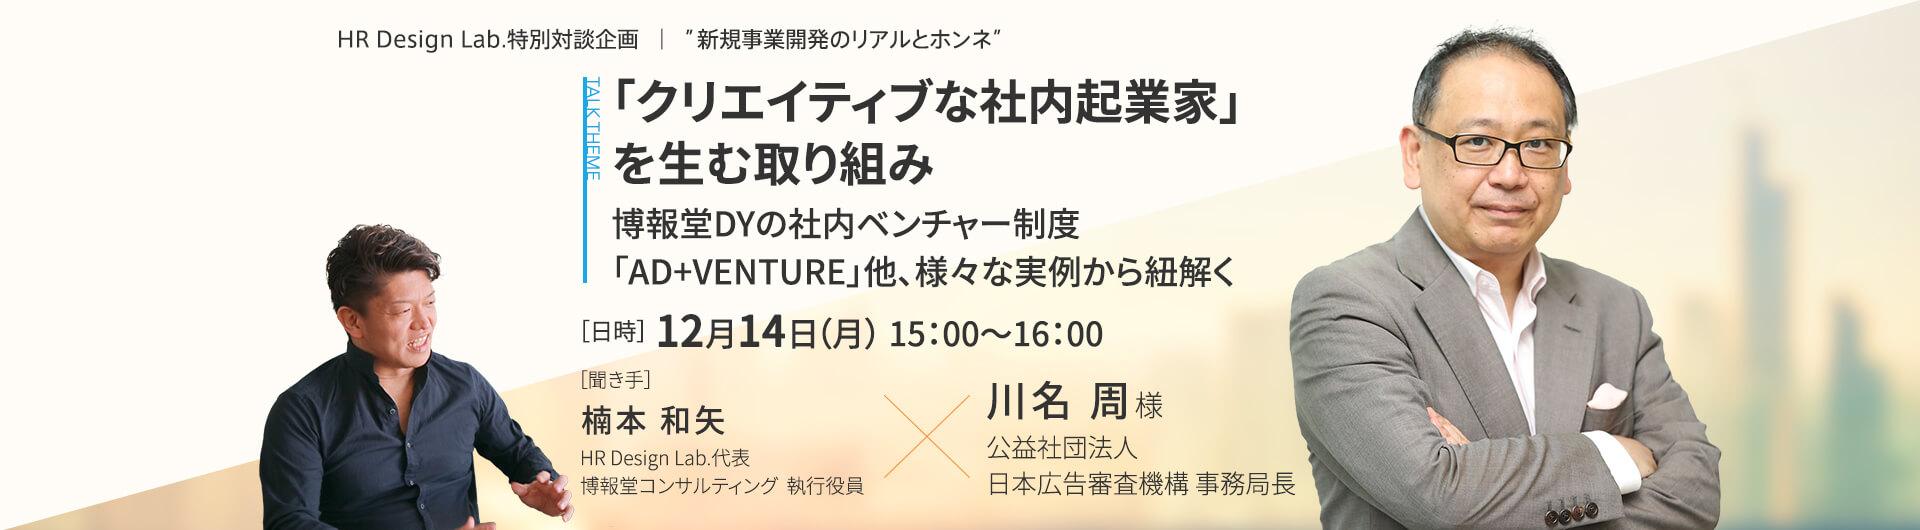 "HR Design Lab.特別対談企画 ""新規事業開発のリアルとホンネ""  (第2回)"